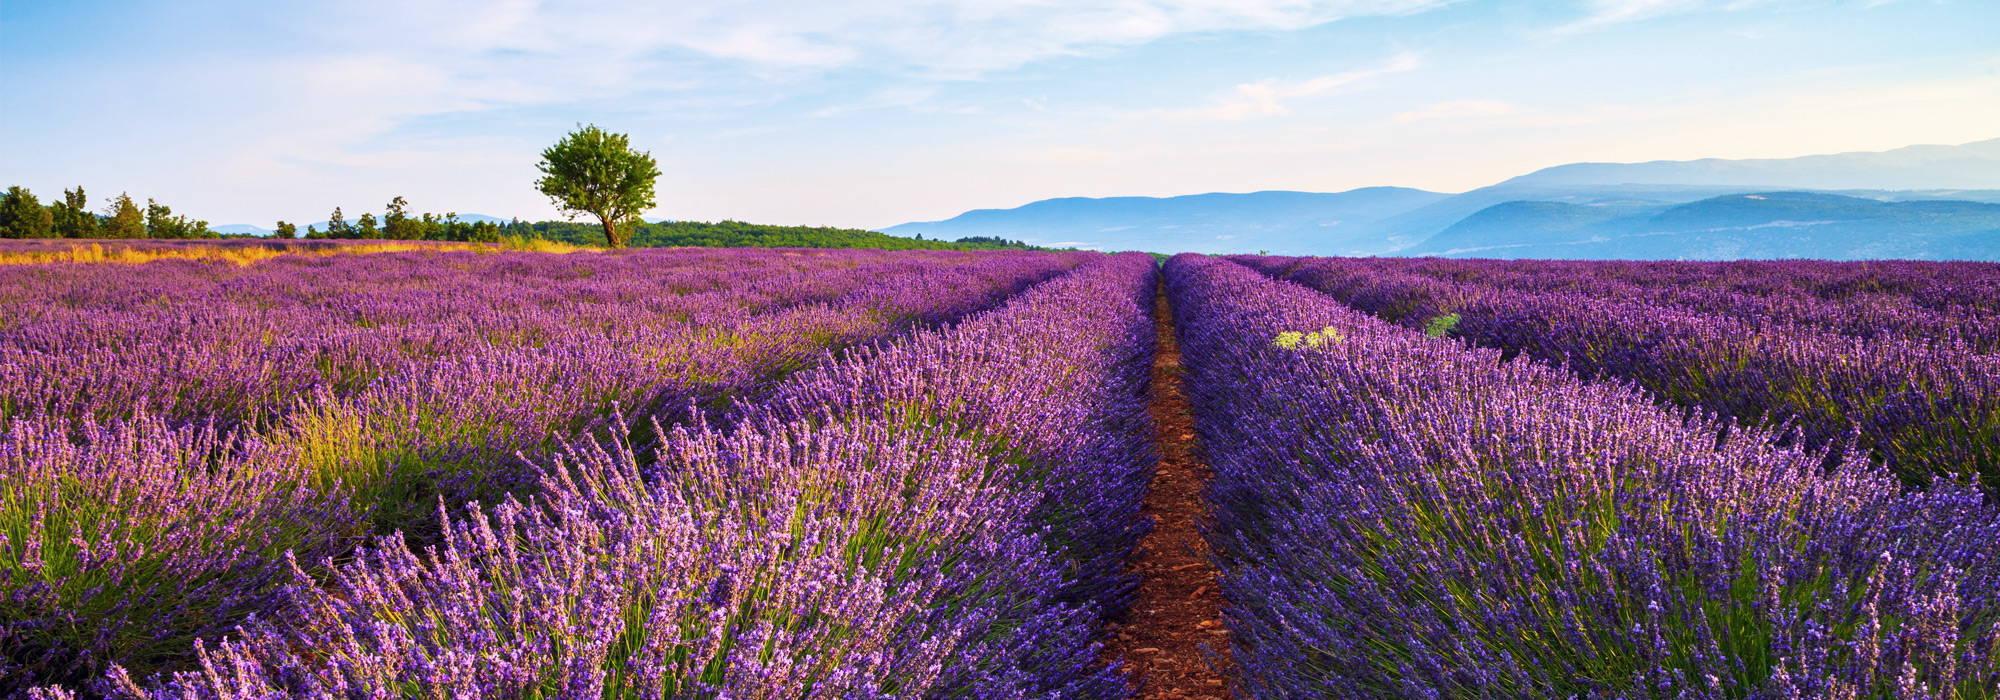 Mademoiselle Provence - Lavender